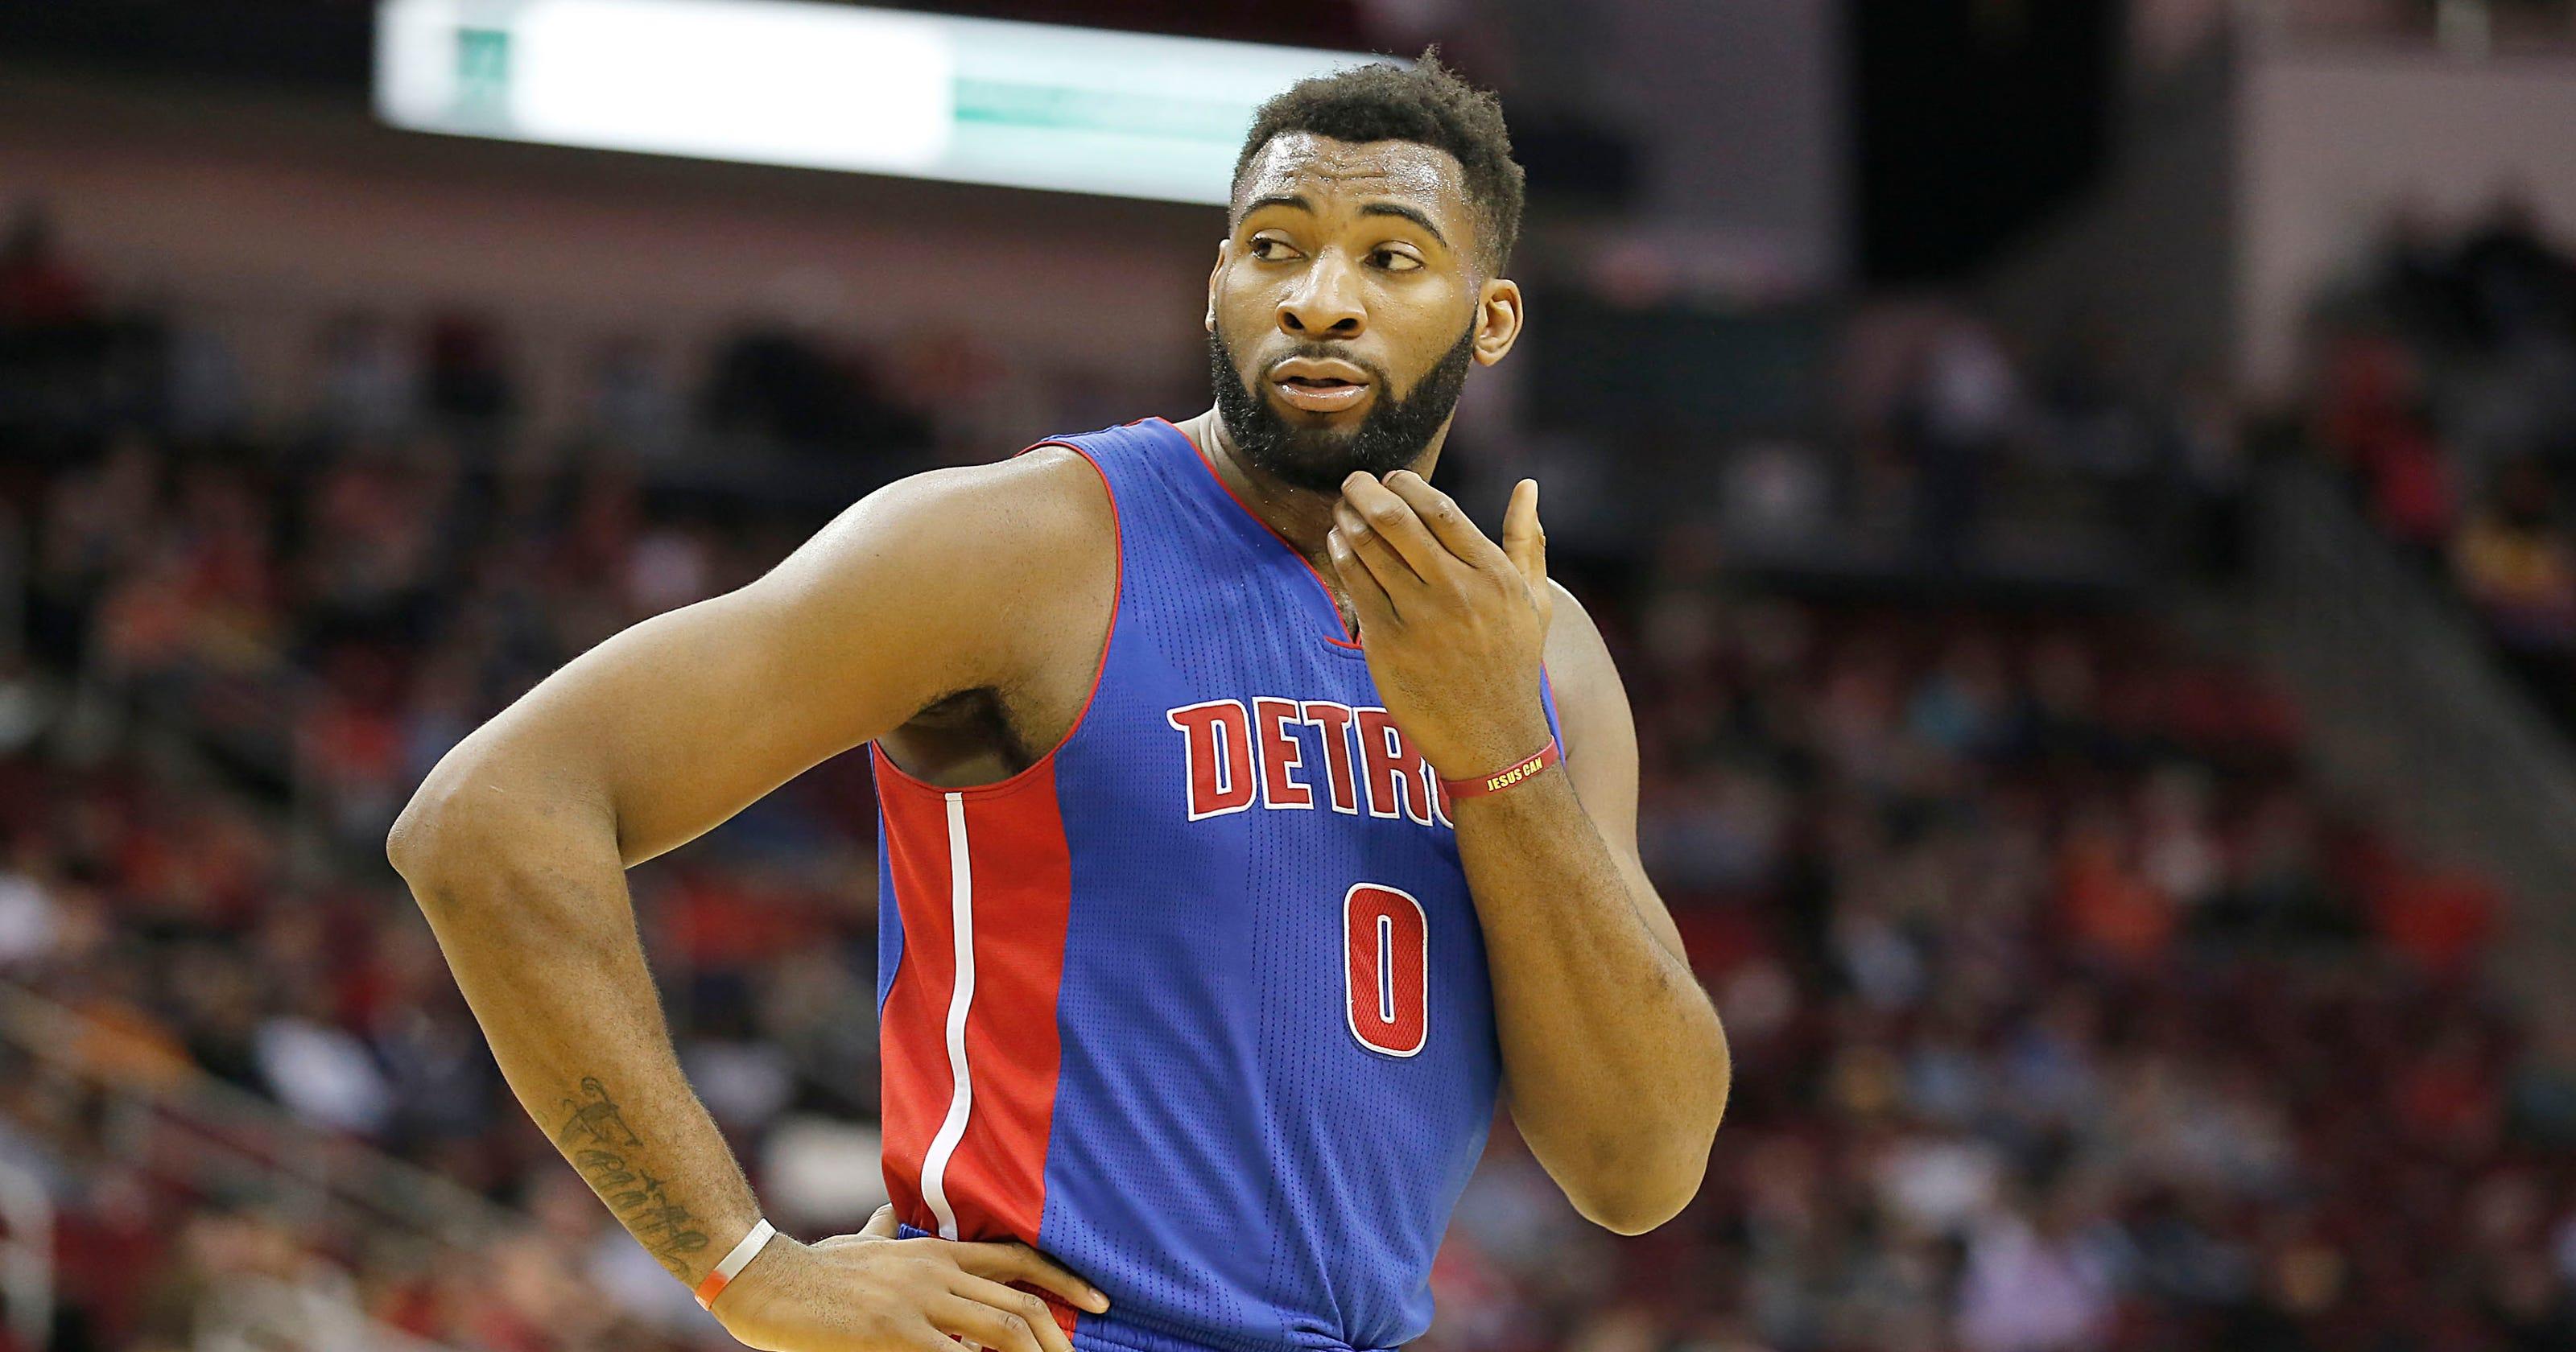 Detroit Pistons  Andre Drummond named NBA All-Star reserve 37663c399